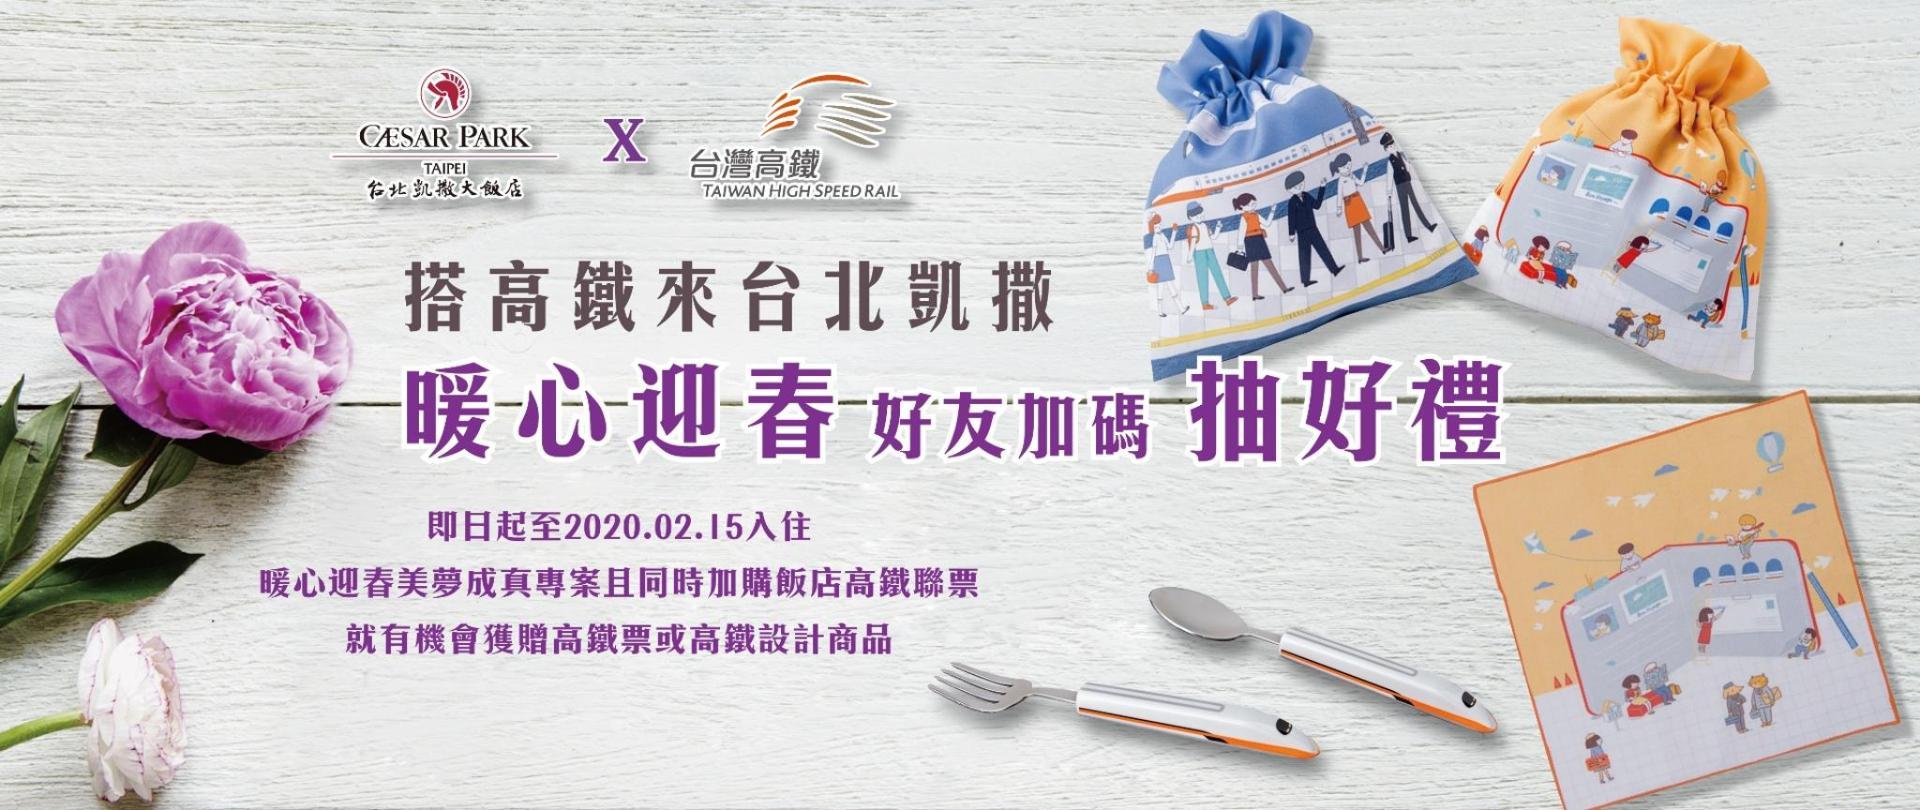 Slide Show1920X810_2019暖心迎春加碼.jpg